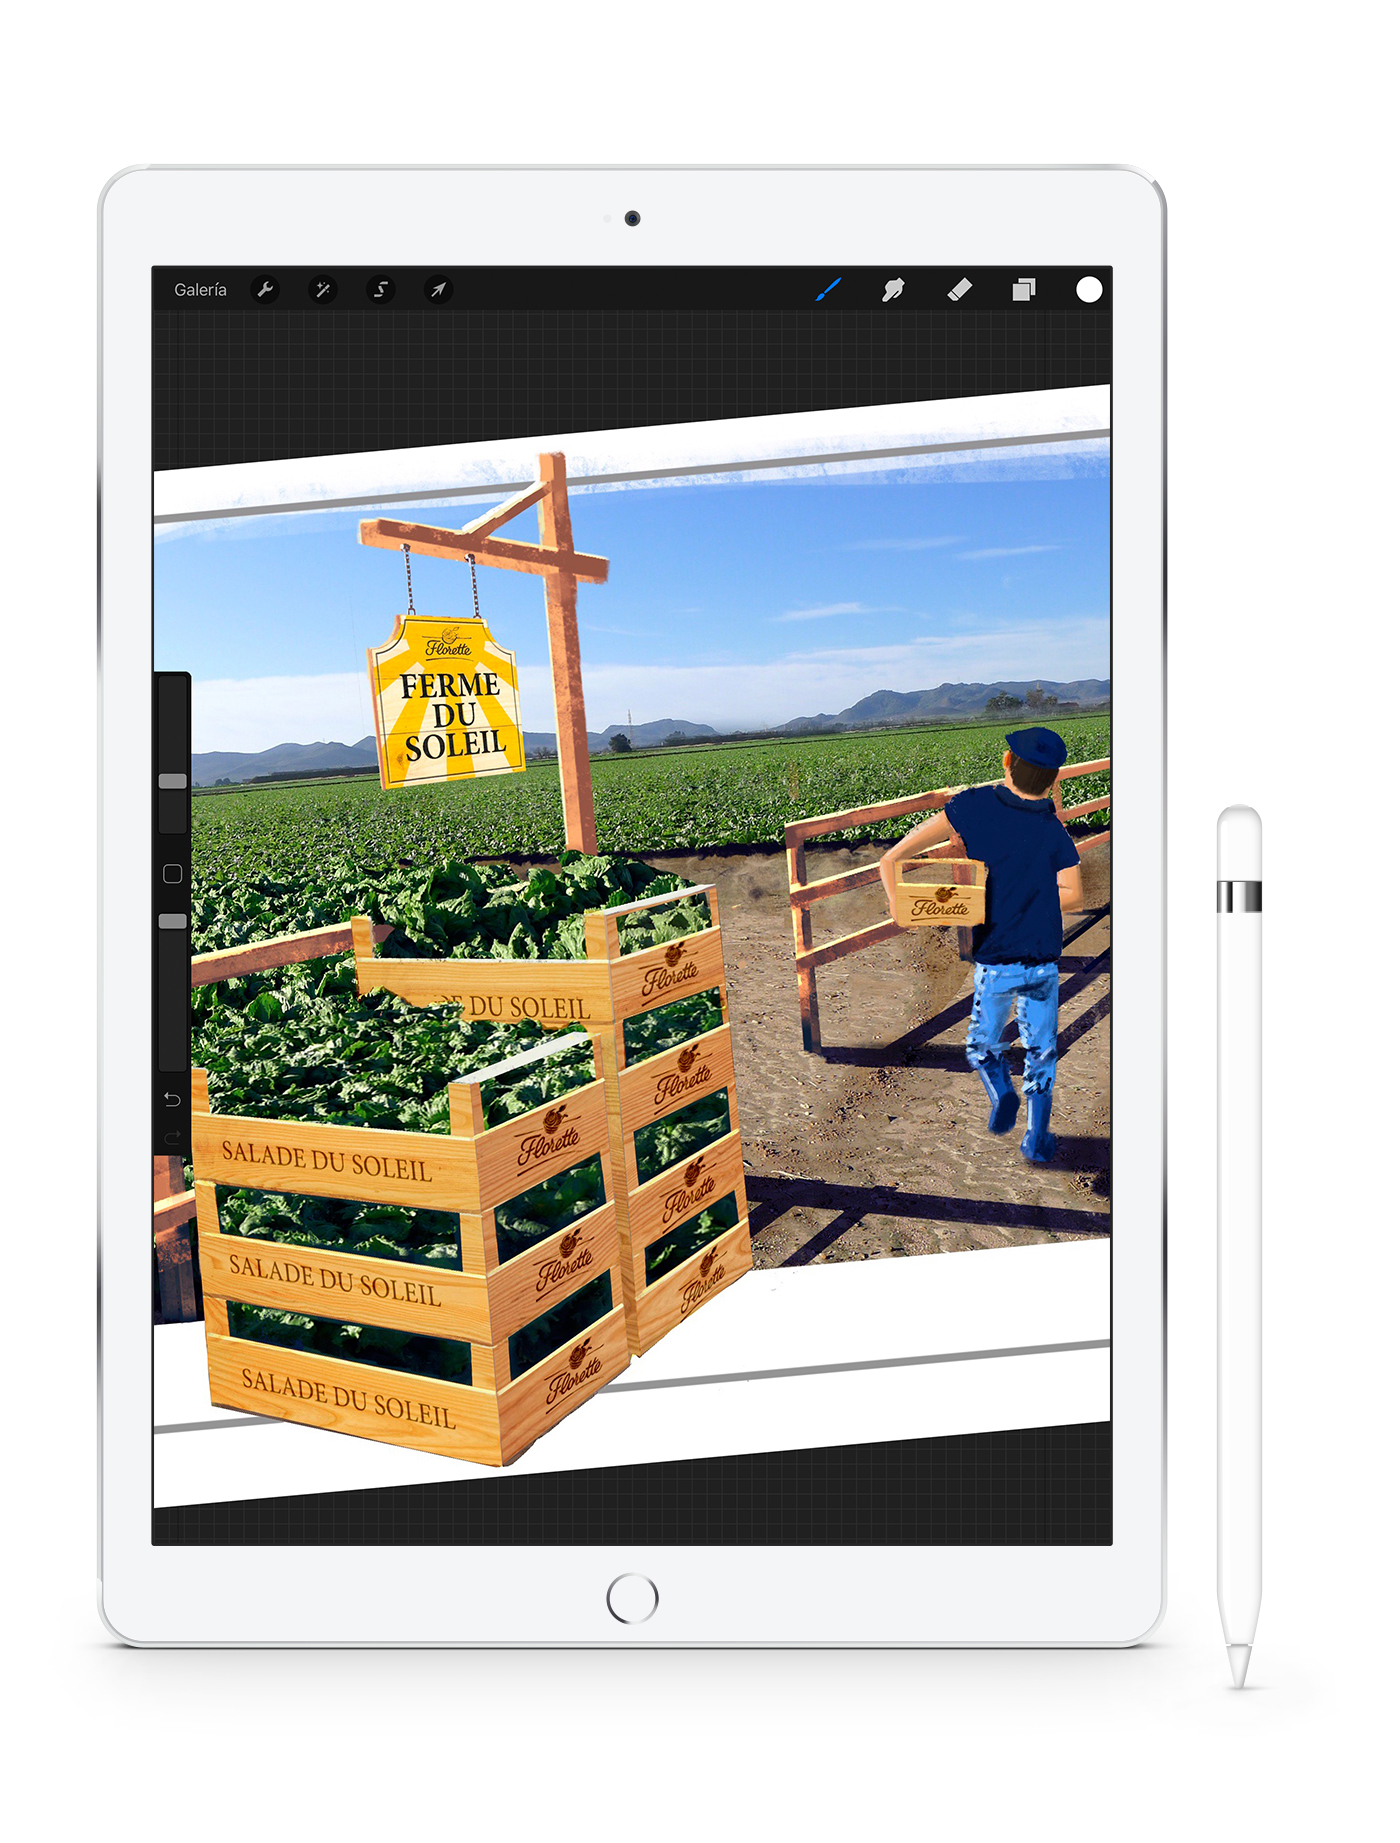 Spot Florette apple iPad Procreate PPM publicidad ilustraciones illustrations